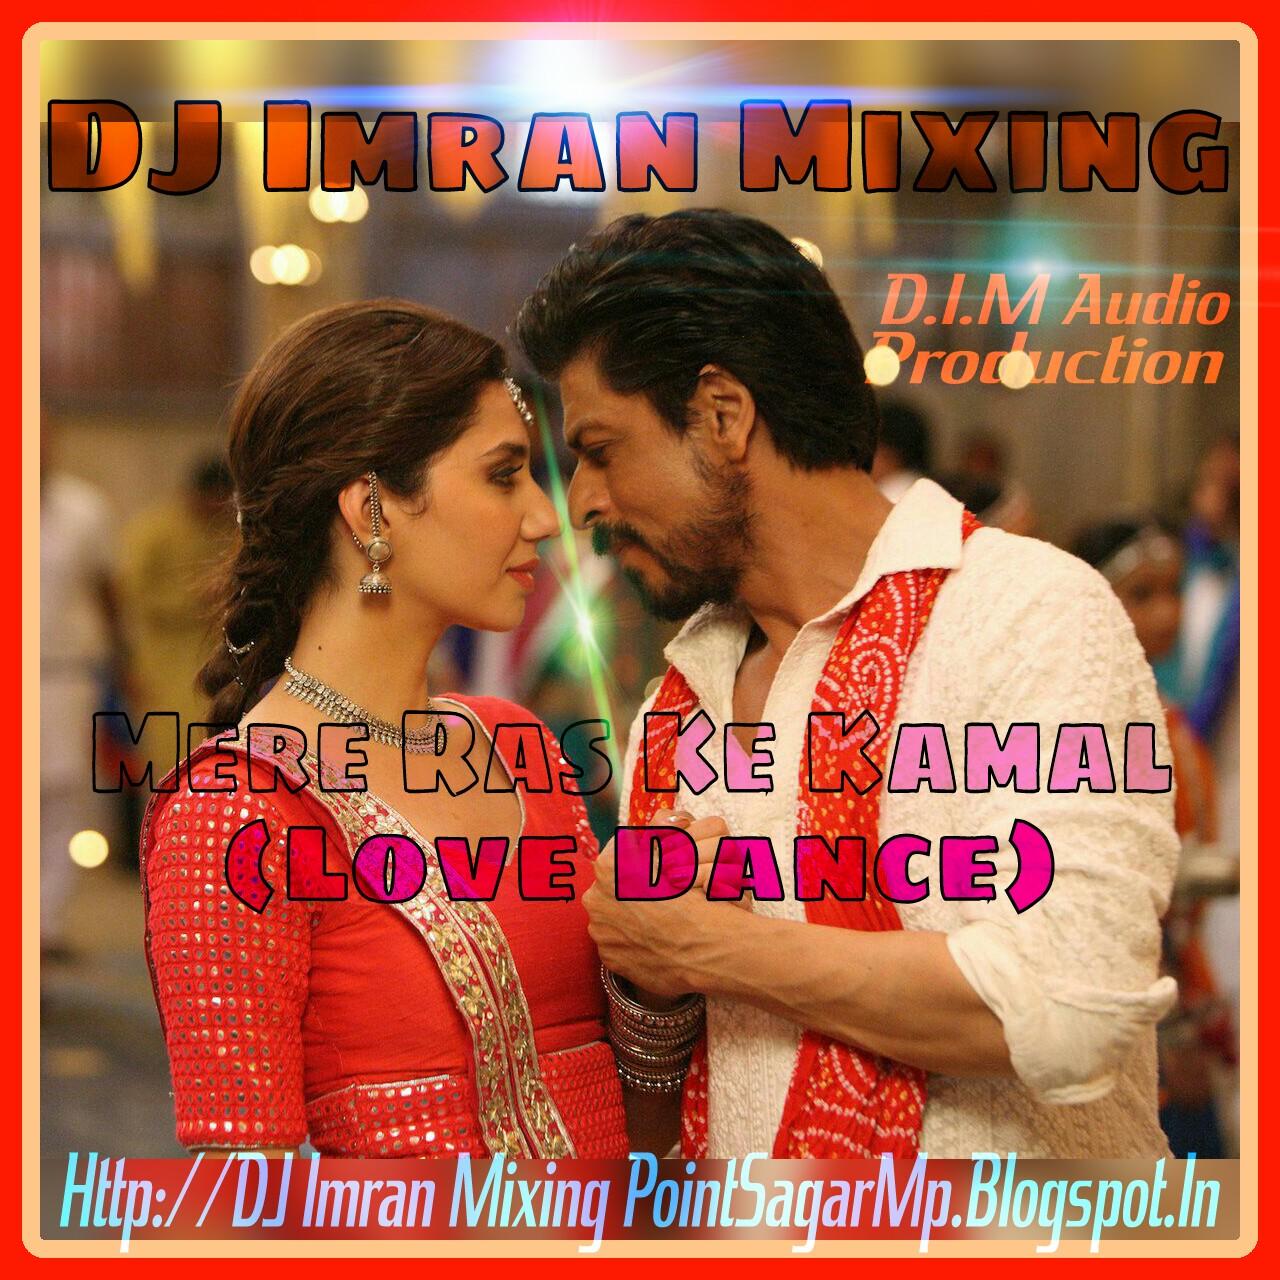 Imran Khan Song I Am Rider Mp3 Download: DJ Imran Mixing_D.I.M Audio Sagar M.P.: Download:-MERE_RAS